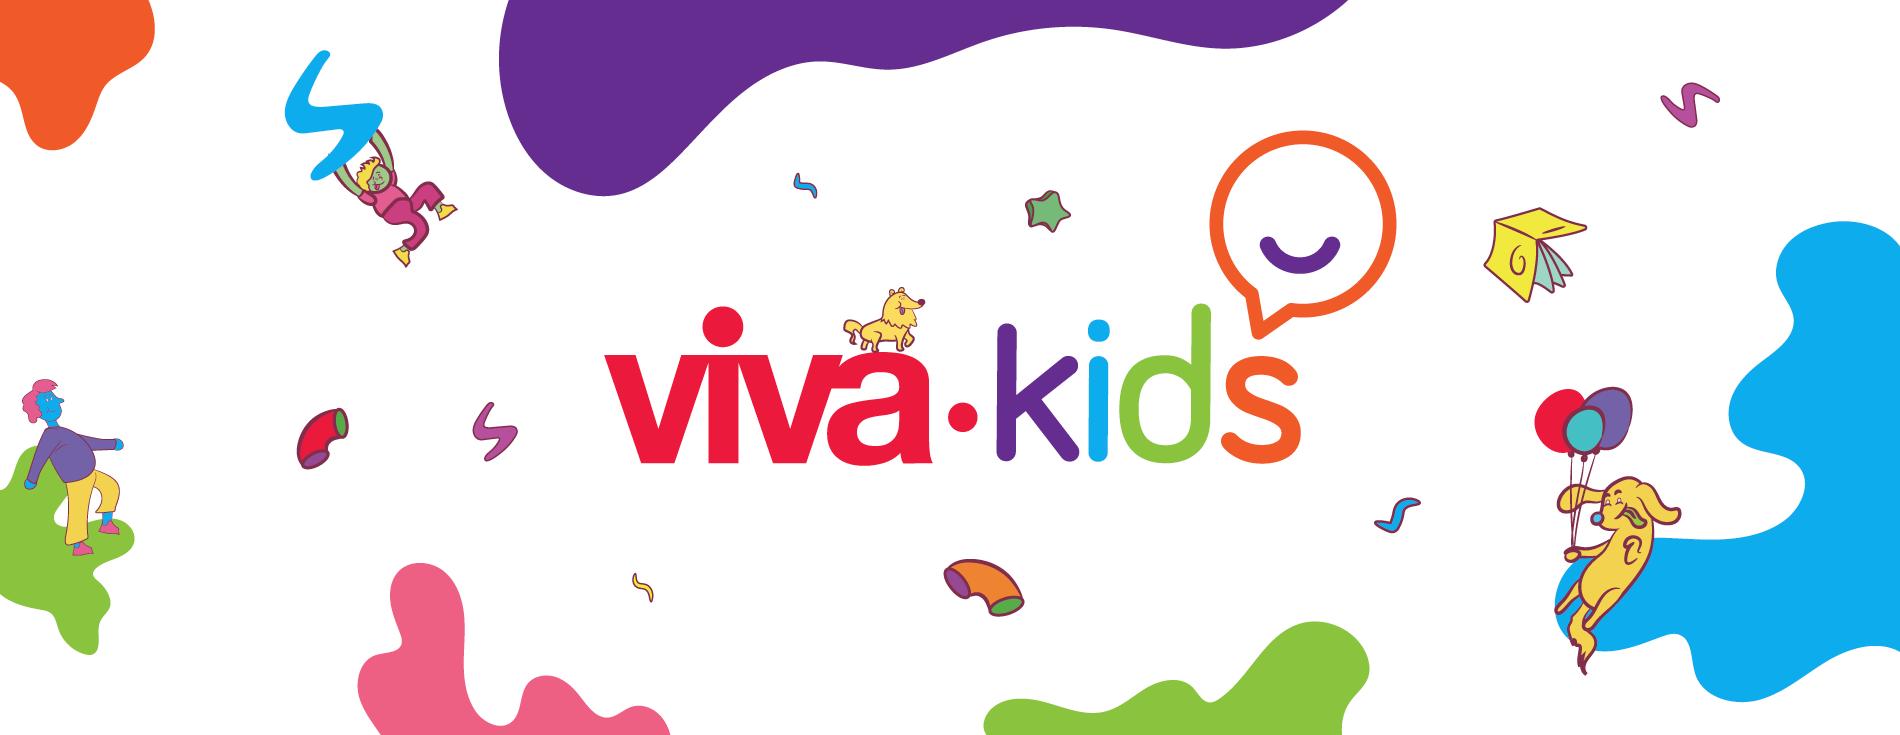 Viva kids - Sincelejo